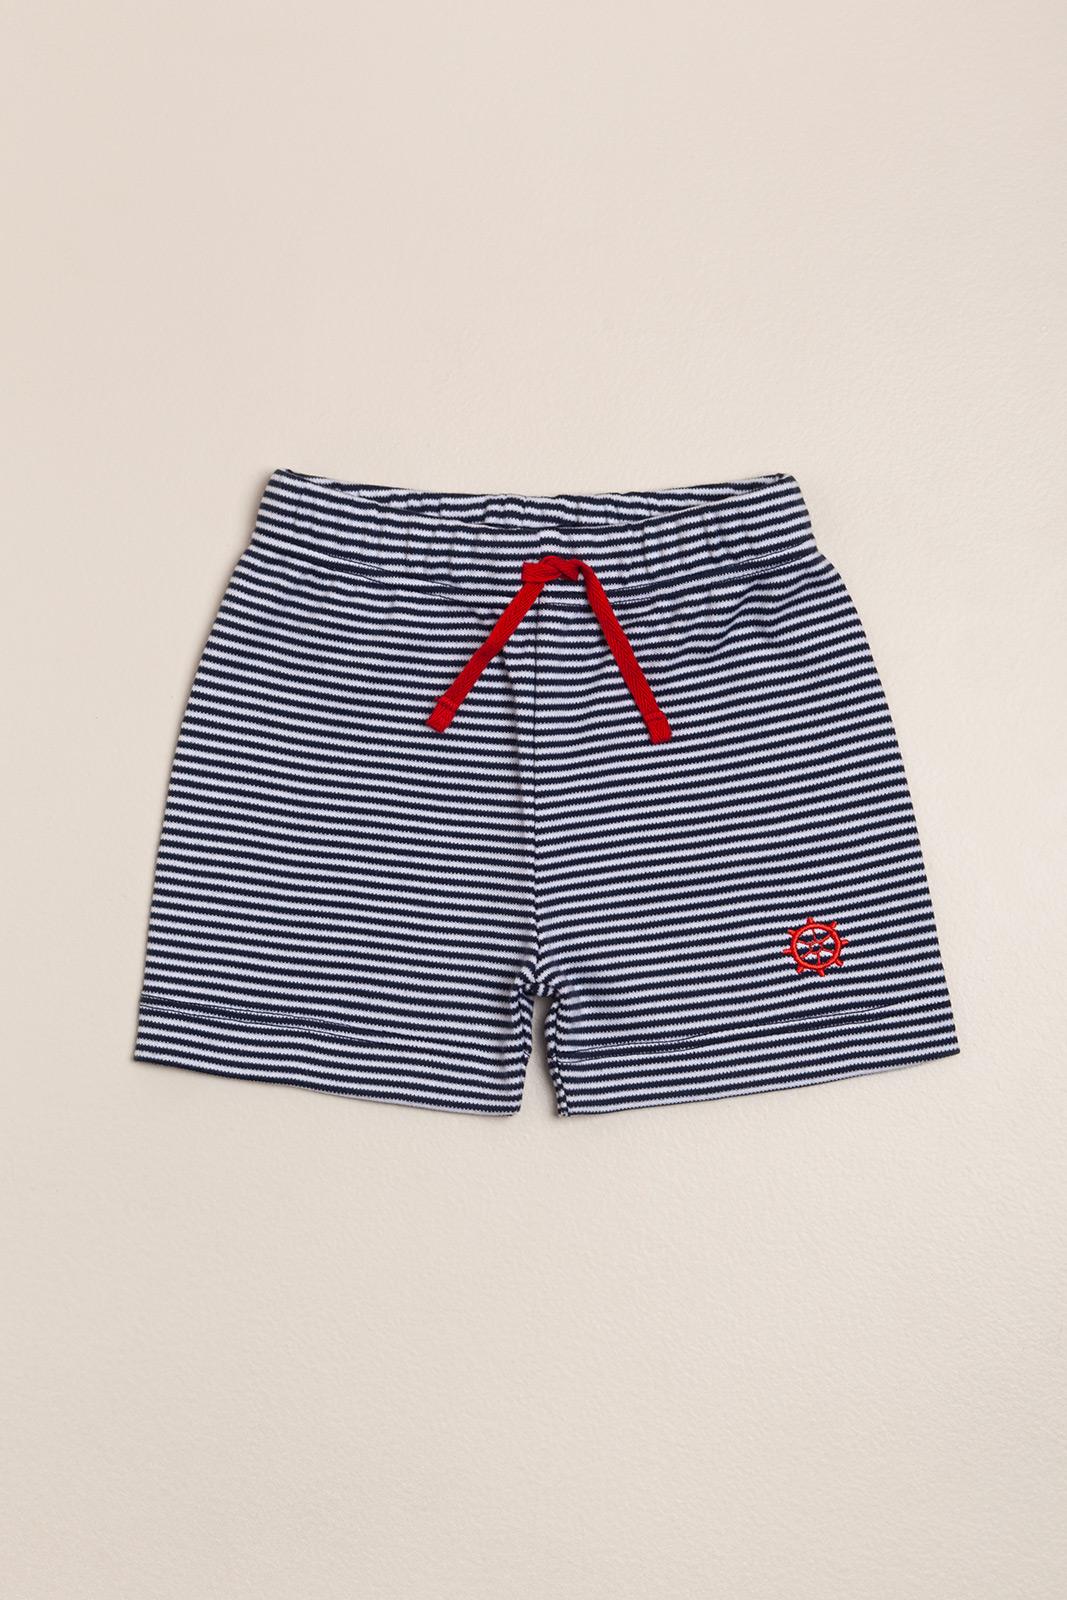 Short rayado pima Navy